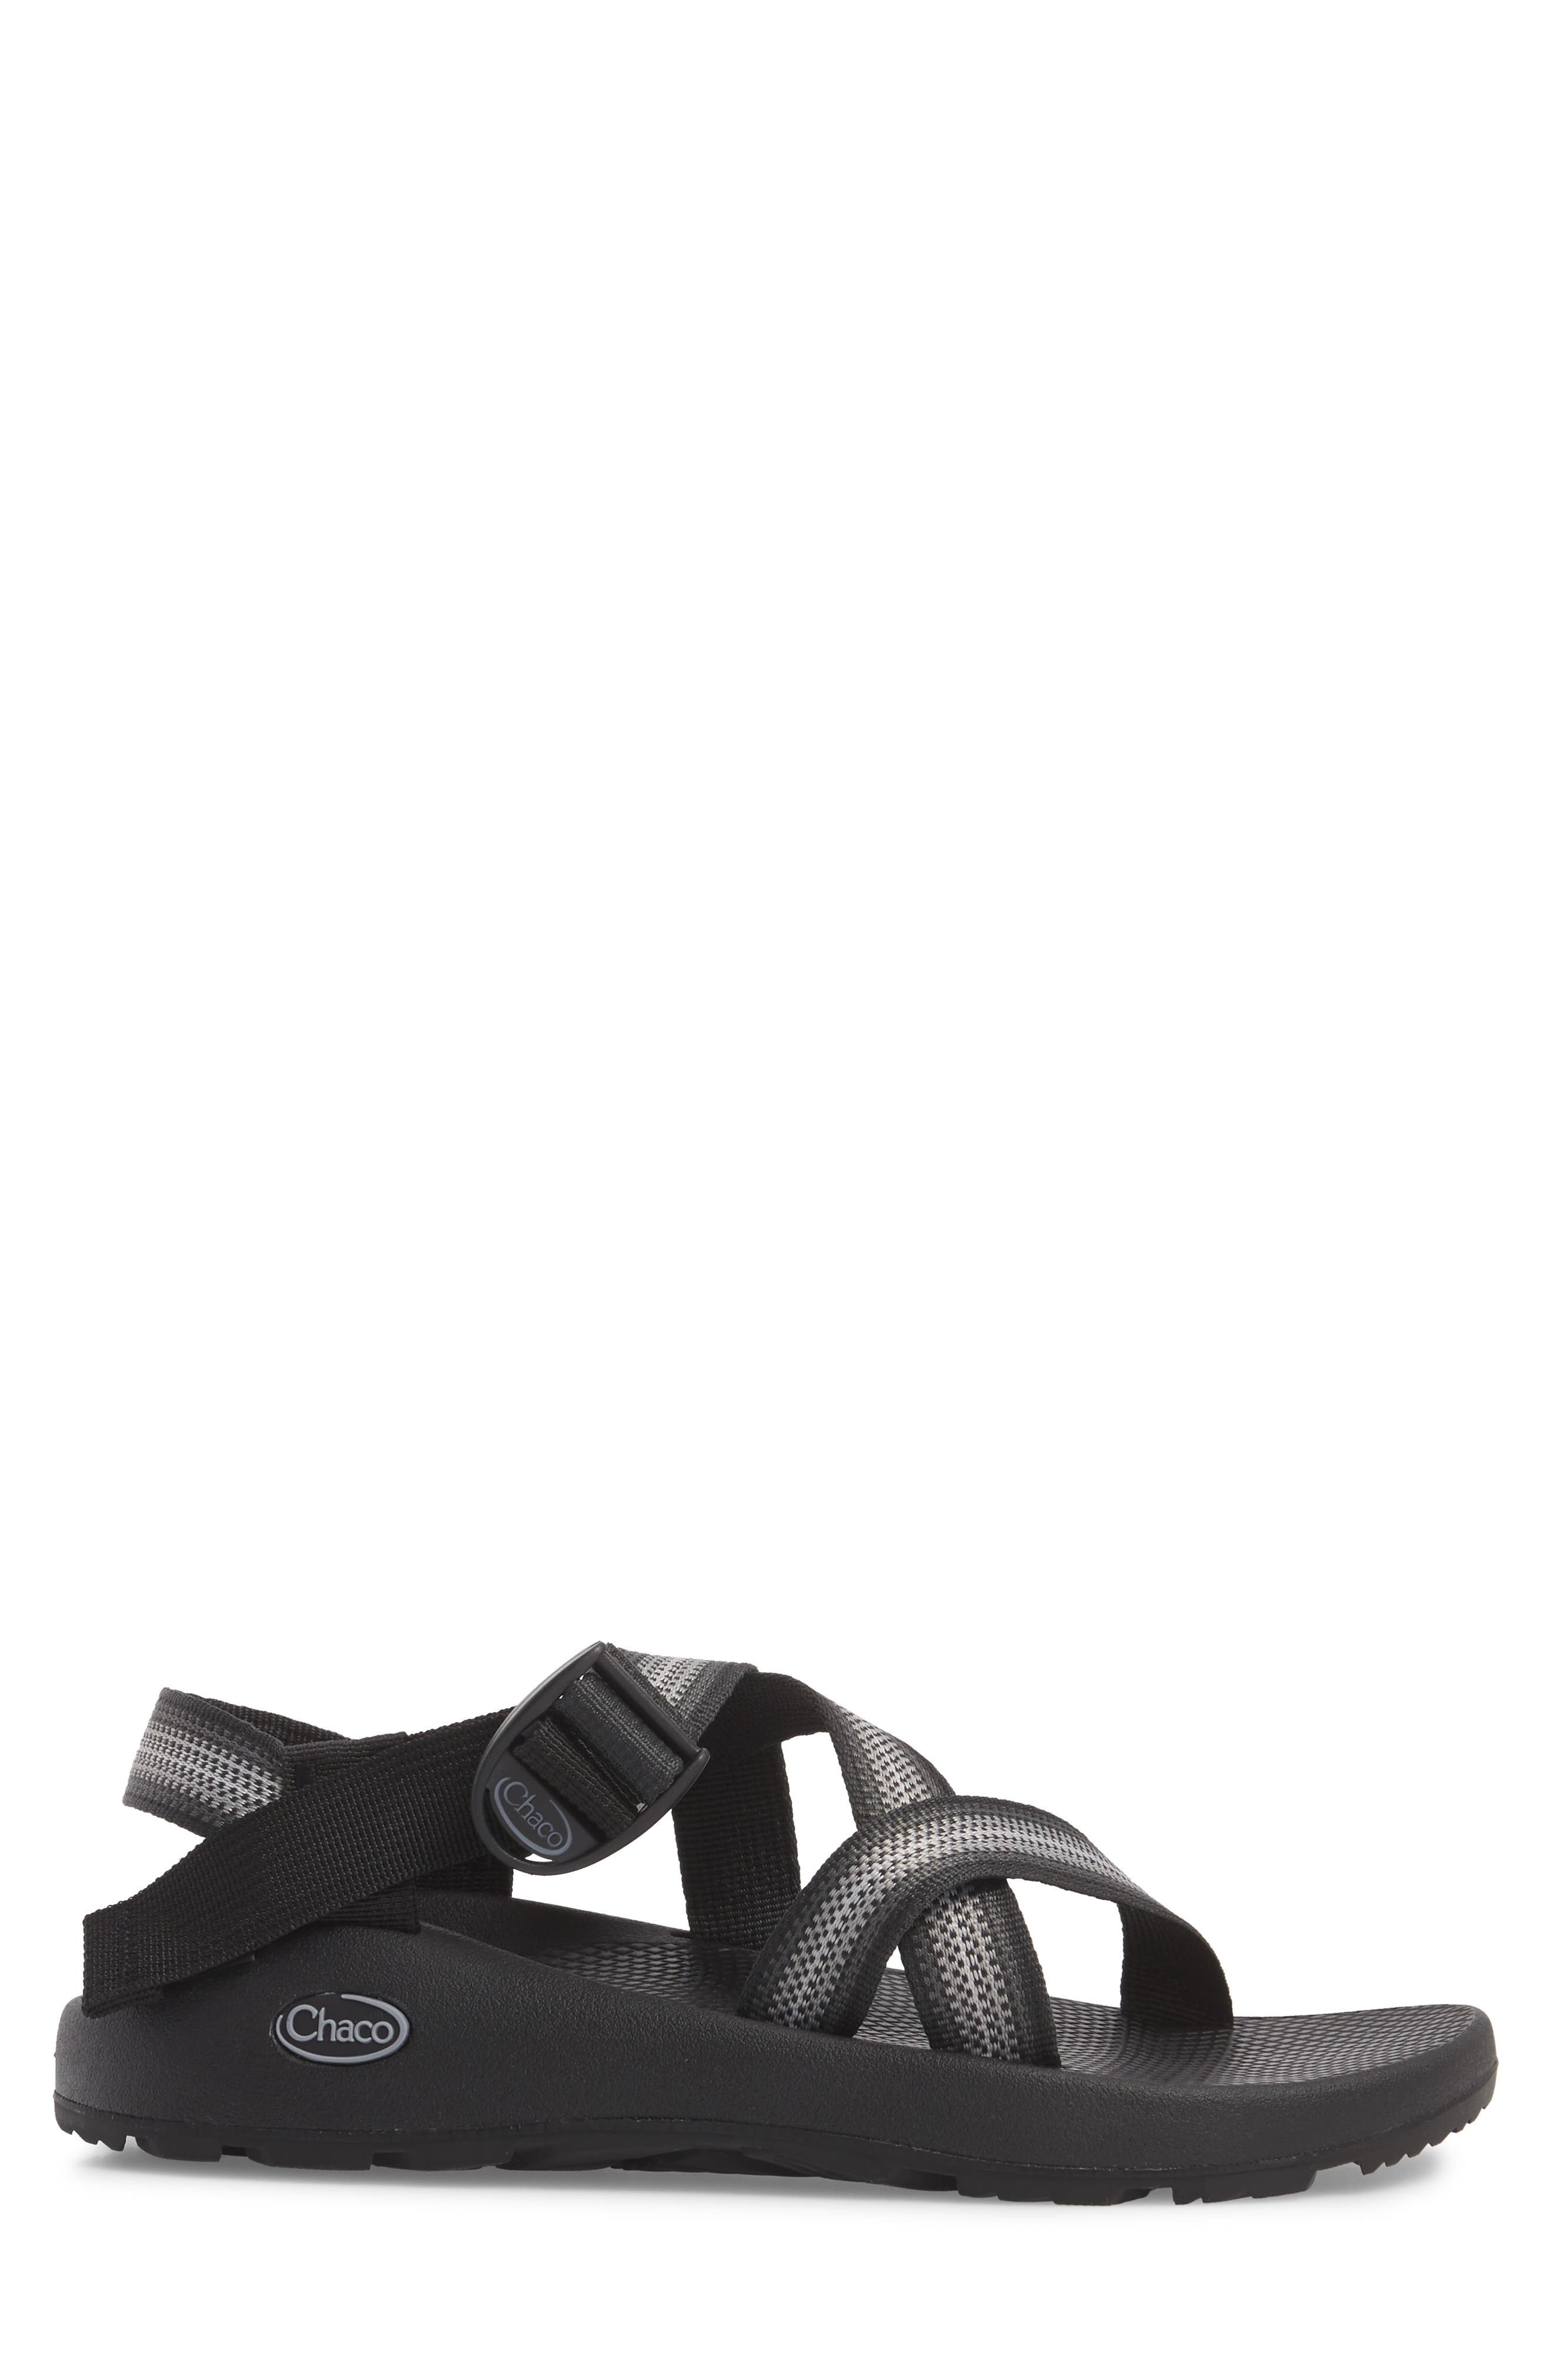 Z/1 Classic Sport Sandal,                             Alternate thumbnail 3, color,                             020